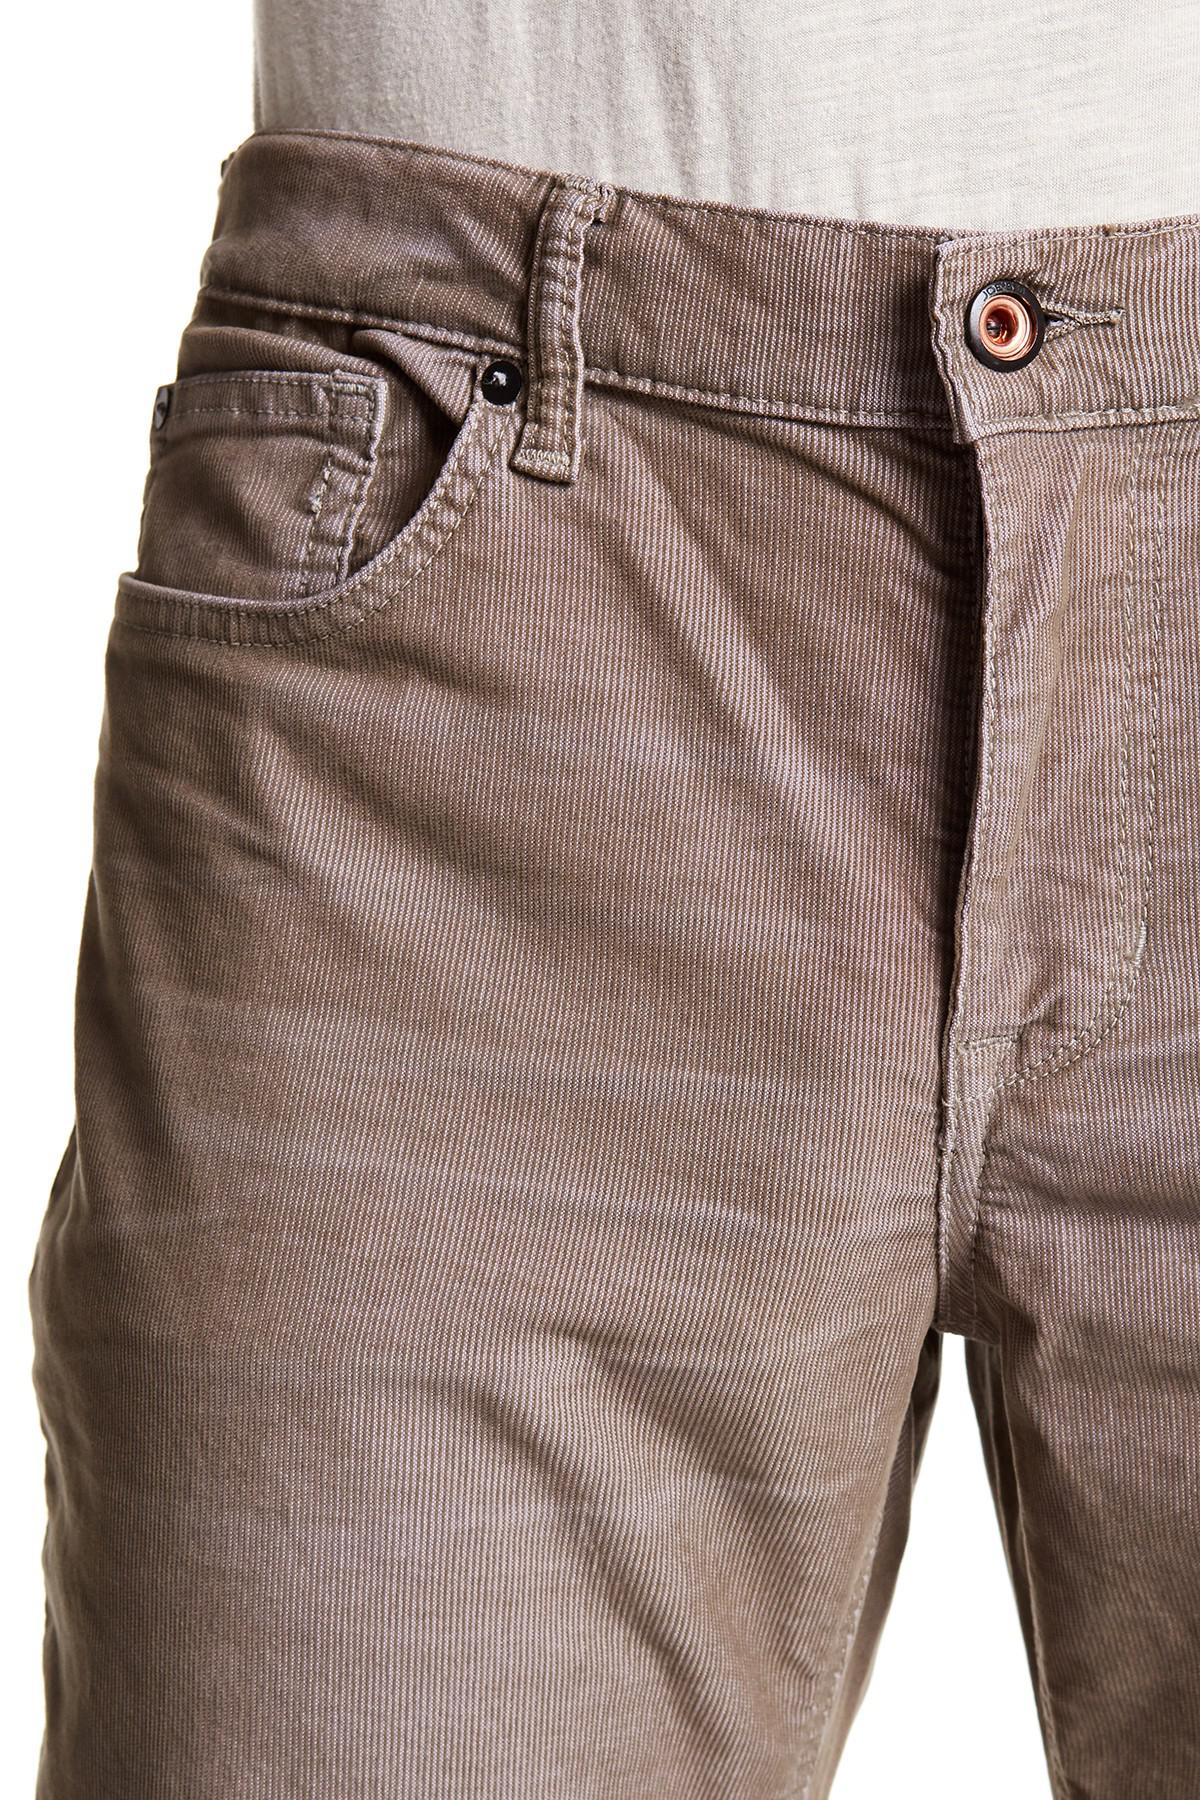 3194686b Lyst - Joe's Jeans Brixton Straight & Narrow Corduroy Pants for Men